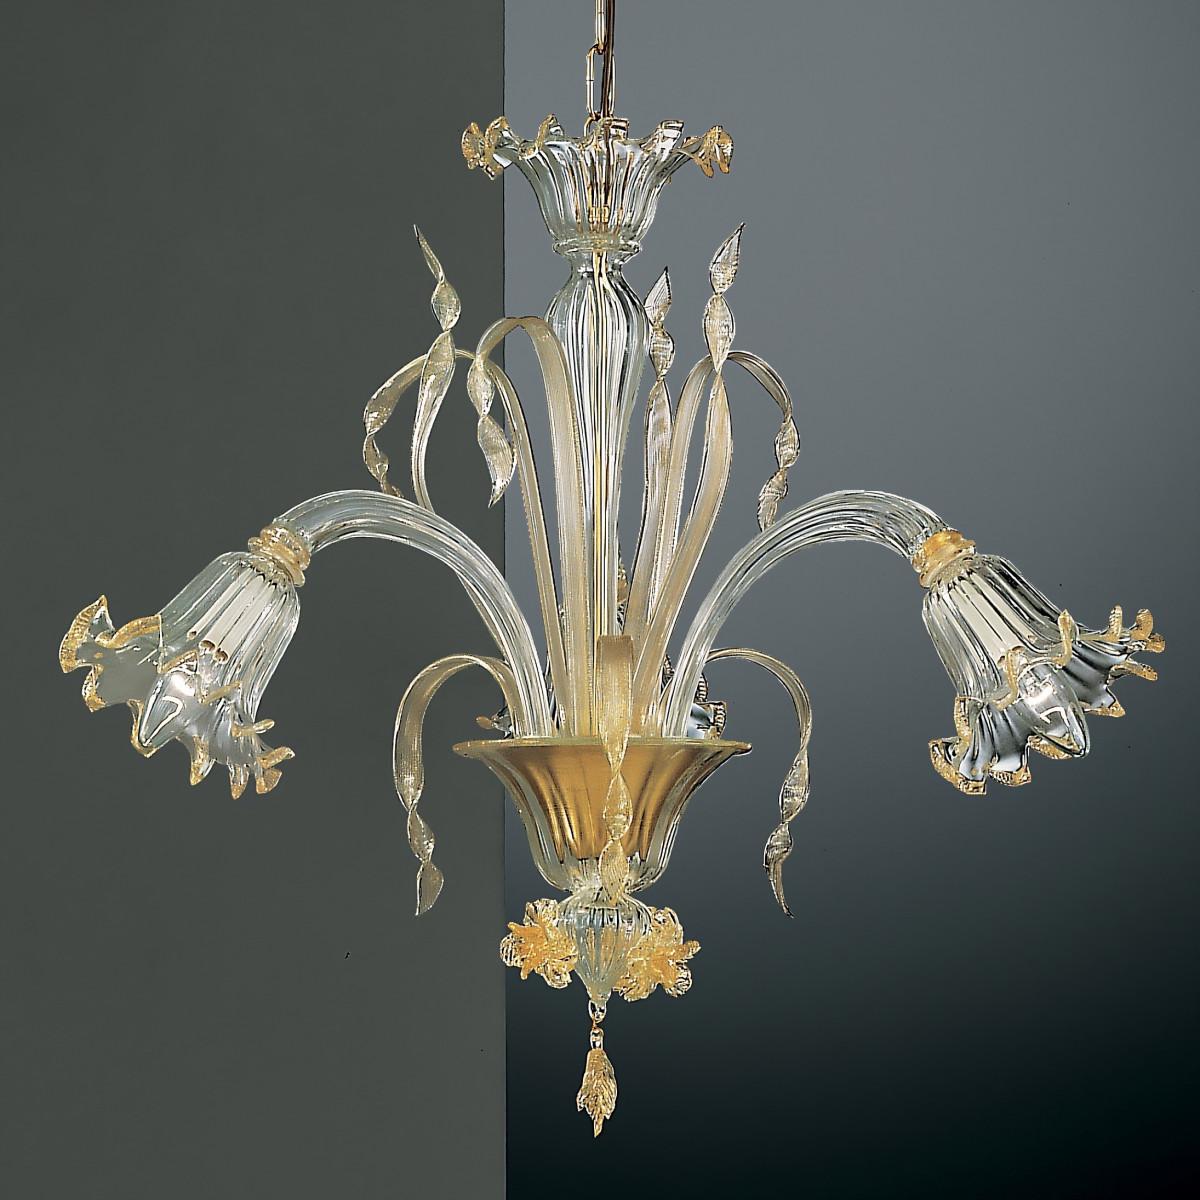 Mori 3 lights Murano chandelier - transparent gold color